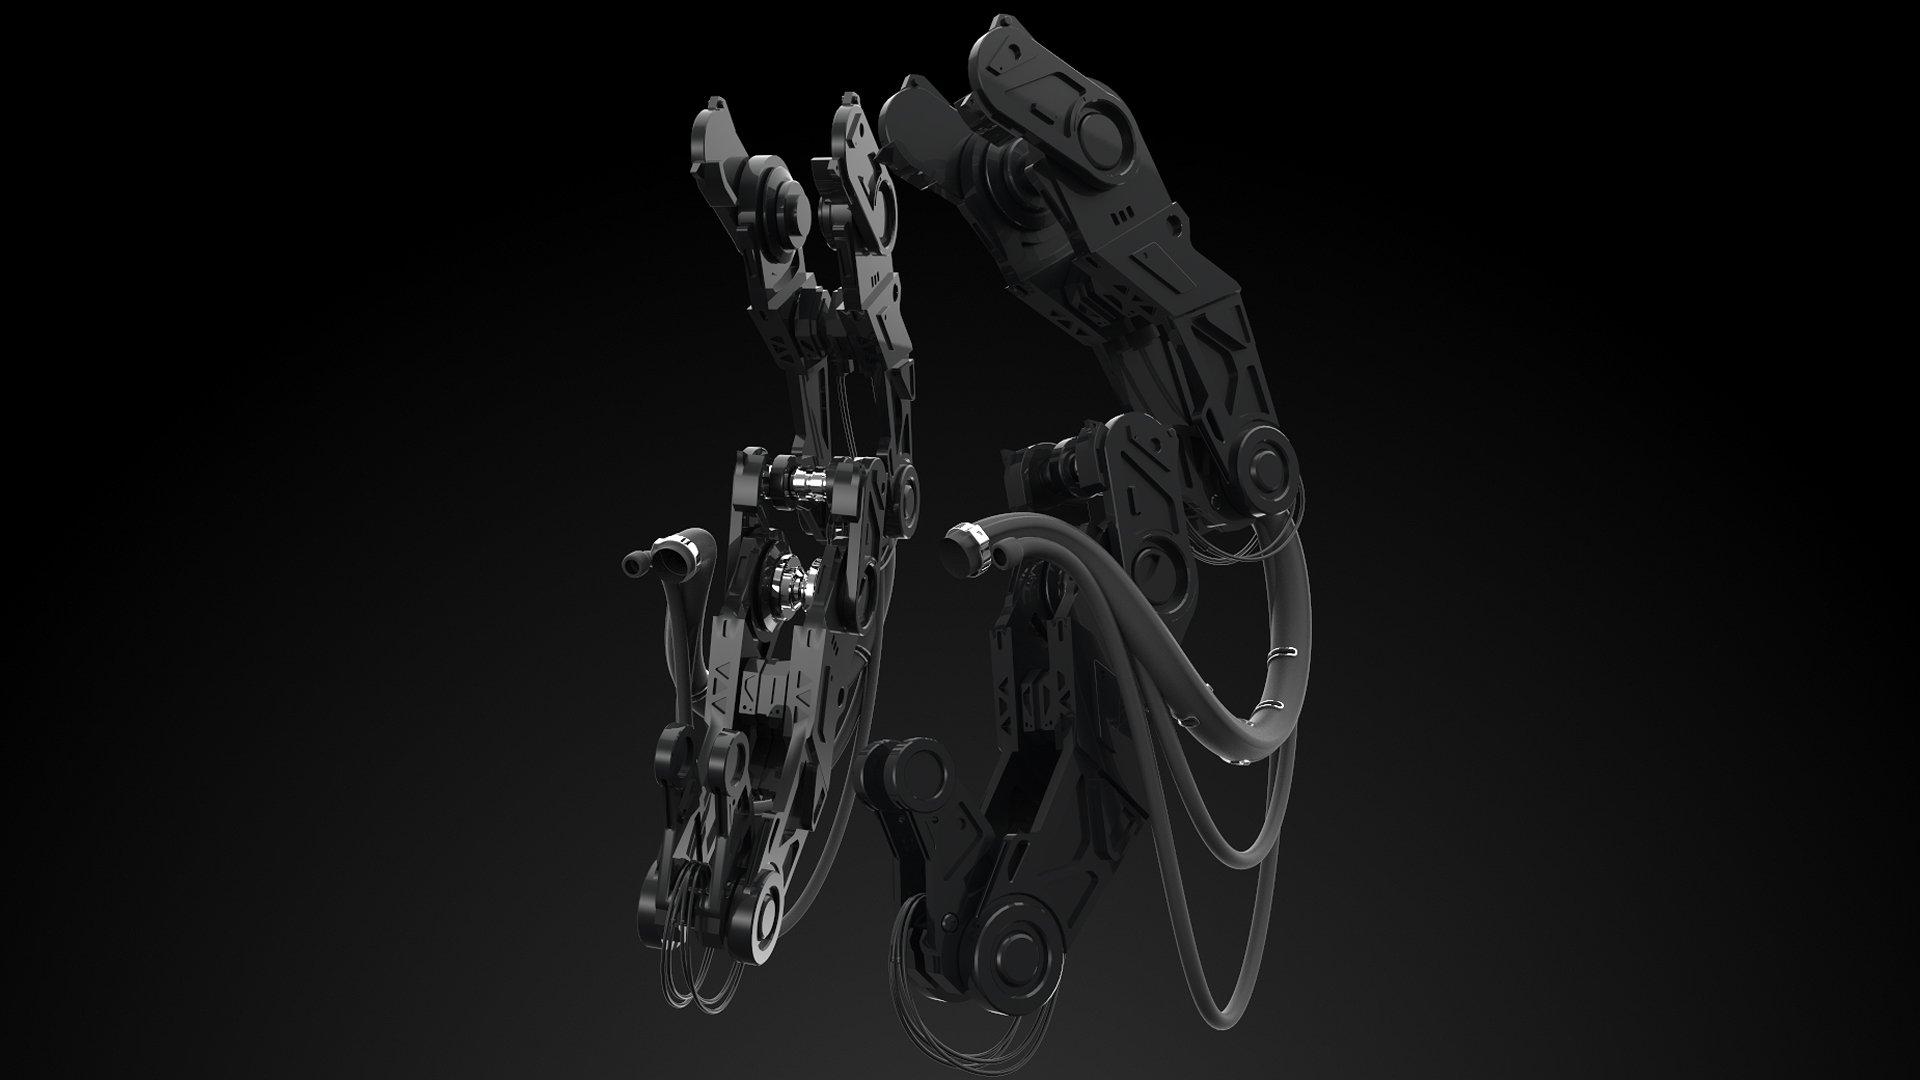 Hard Surface 3D Modeling in C4D - Elementza 3D Art Tutorials and